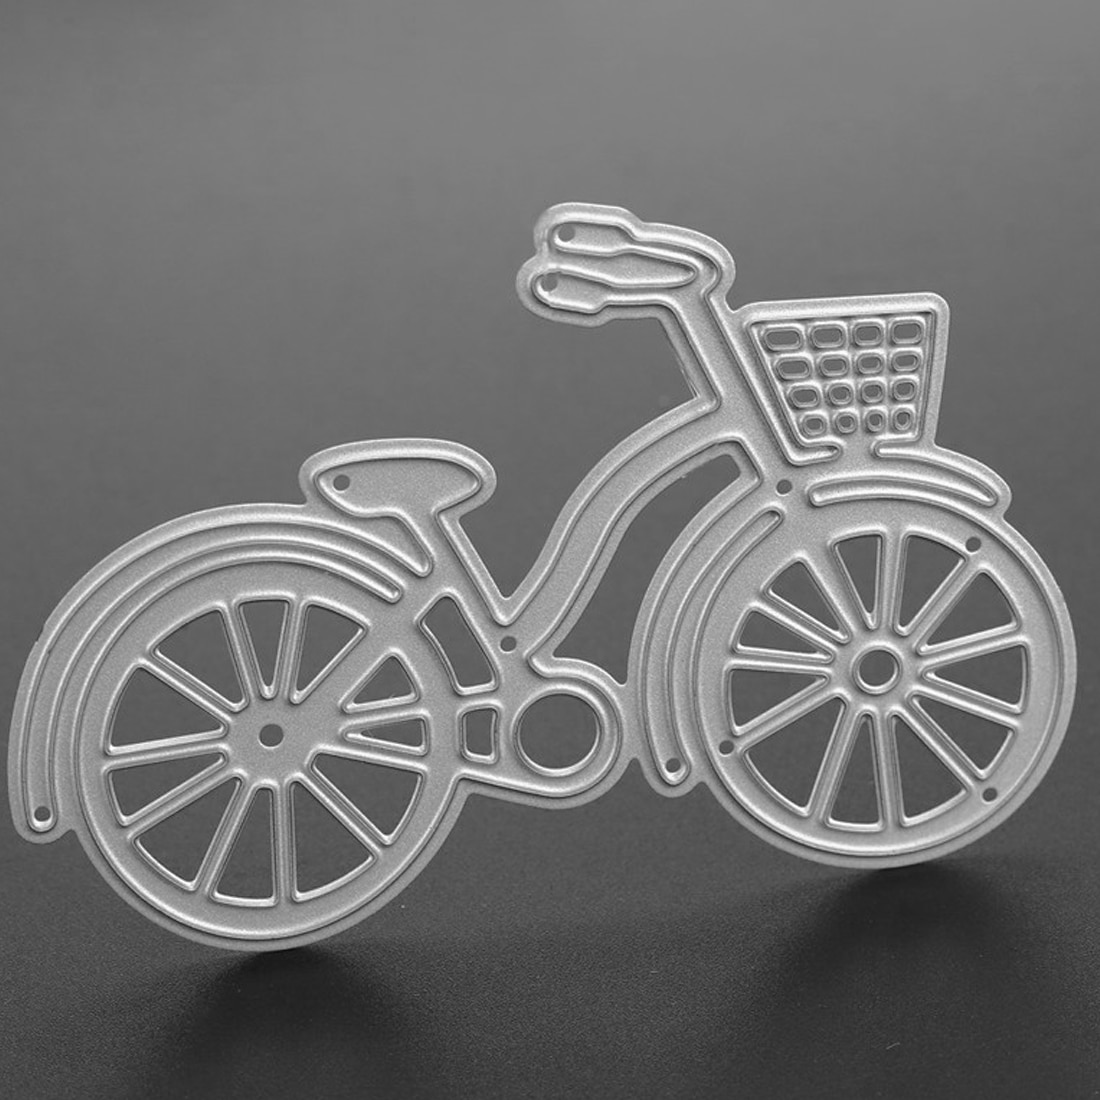 New Arrival  Bicycle cutting dies Metal Cutting Dies Stencils for DIY Scrapbooking dies Decorative Craft Photo Album Embossing